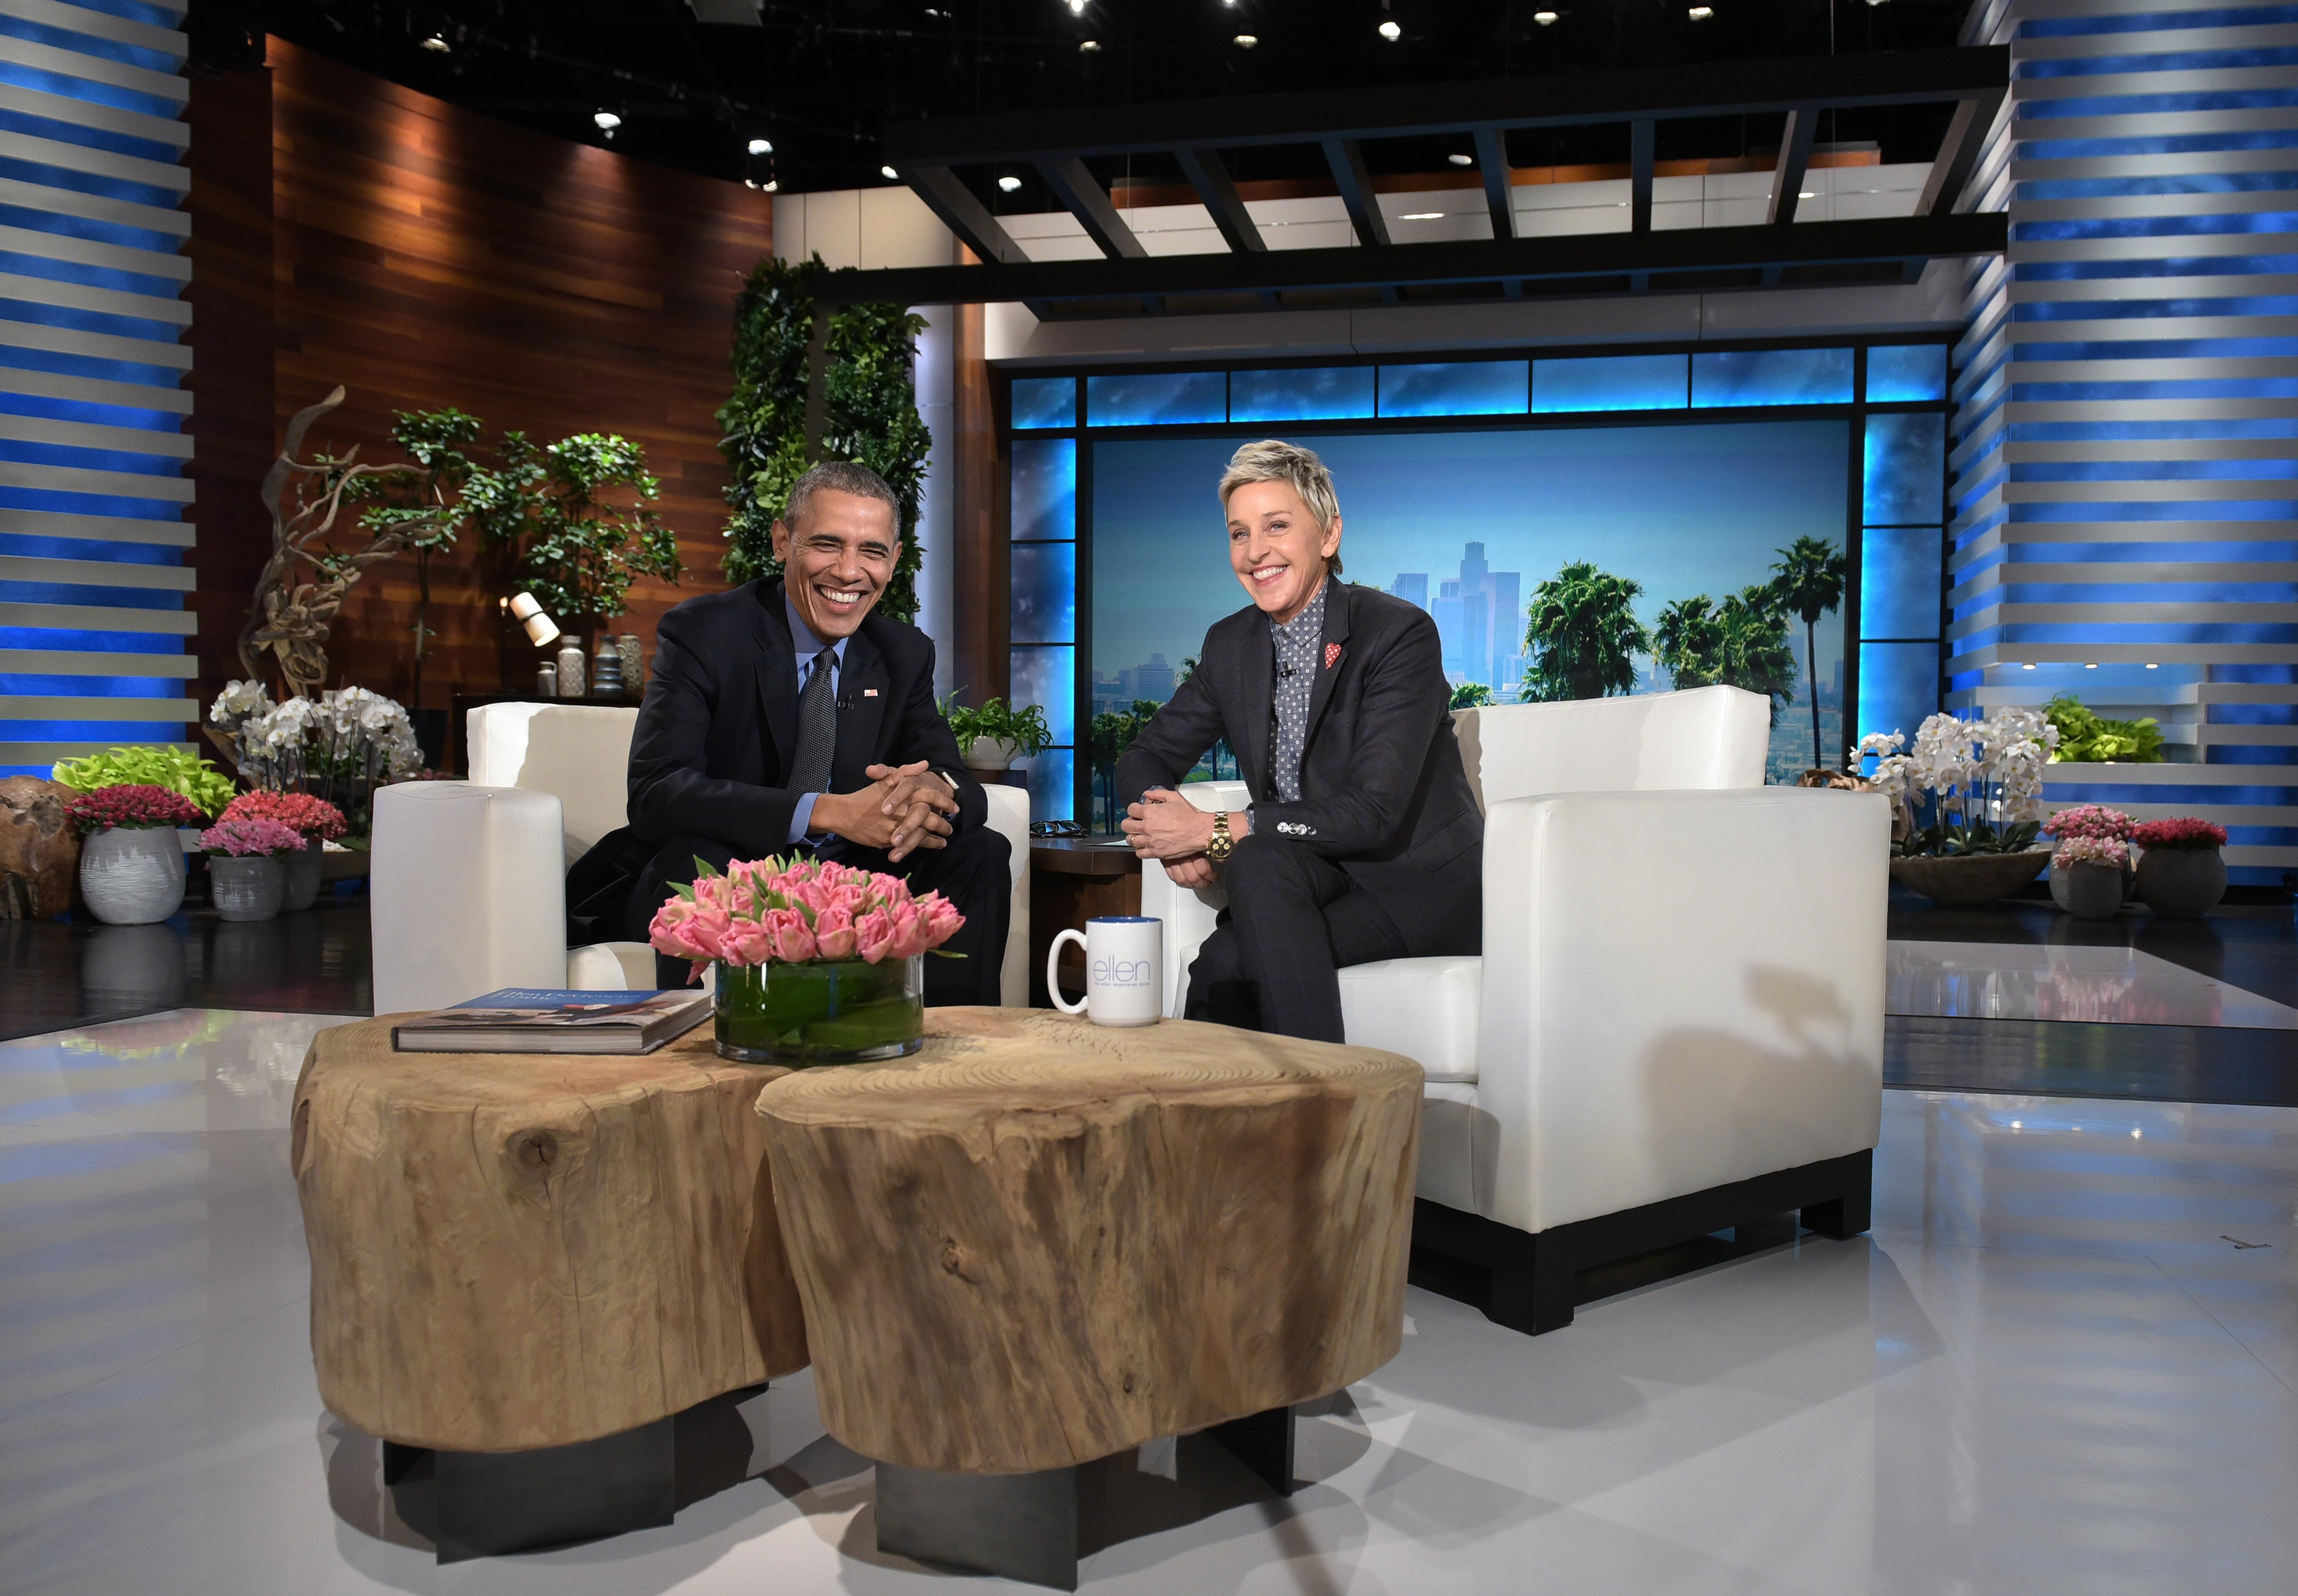 US President Barack Obama and talk show host Ellen DeGeneres are seen during a break in the taping of The Ellen DeGeneres show at Warner Brothers Studios in Burbank, Calif. on Feb. 11, 2016.